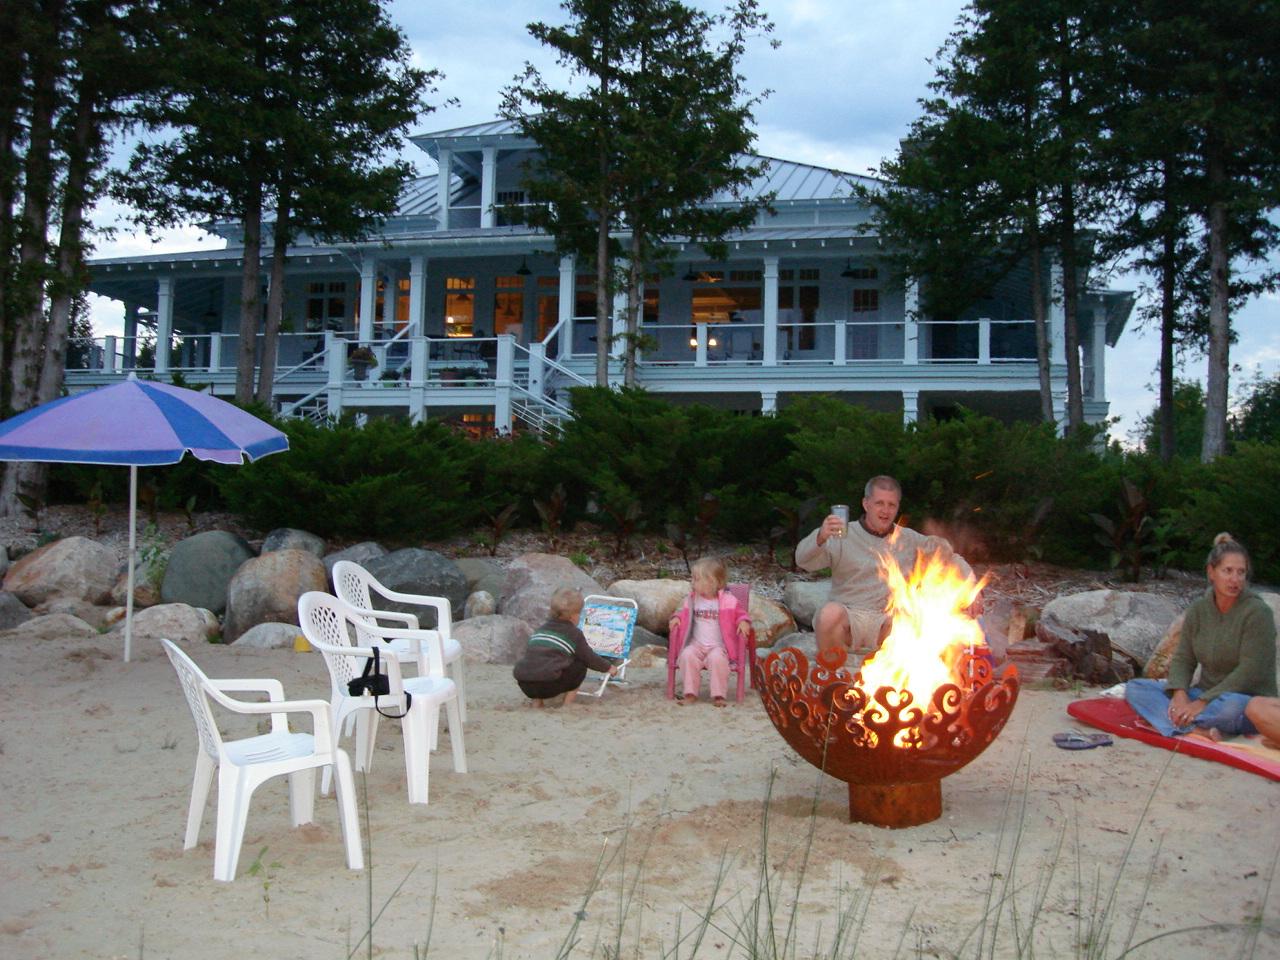 Great Bowl O' Fire 37 Inch Sculptural Firebowl™ on Lake Michigan